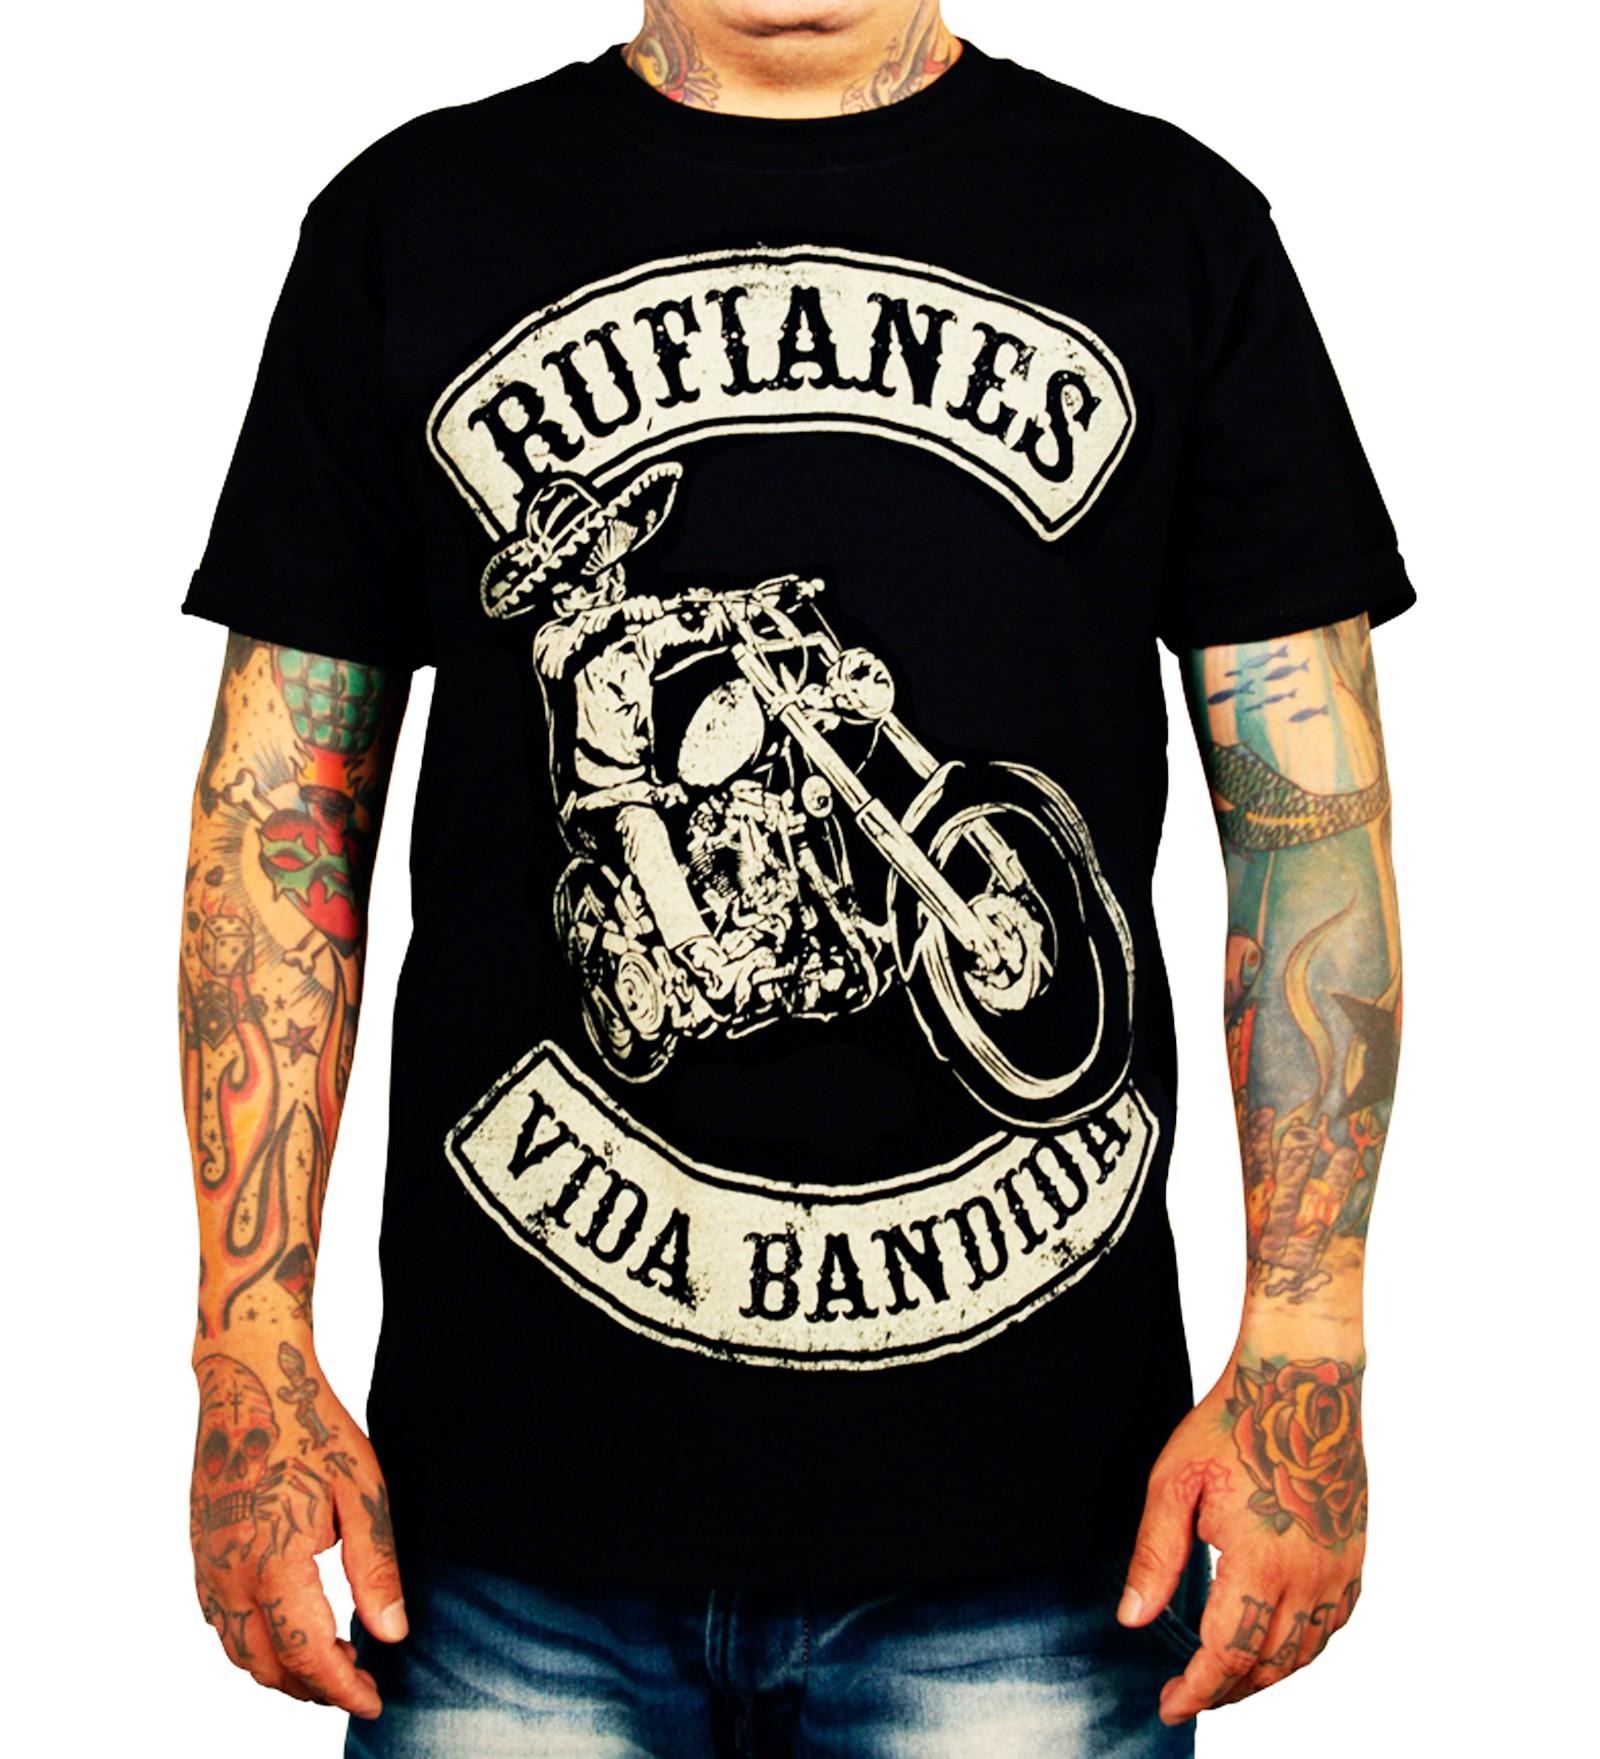 La Marca Del Diablo - Rufianes Vida Bandida T-Shirt Front